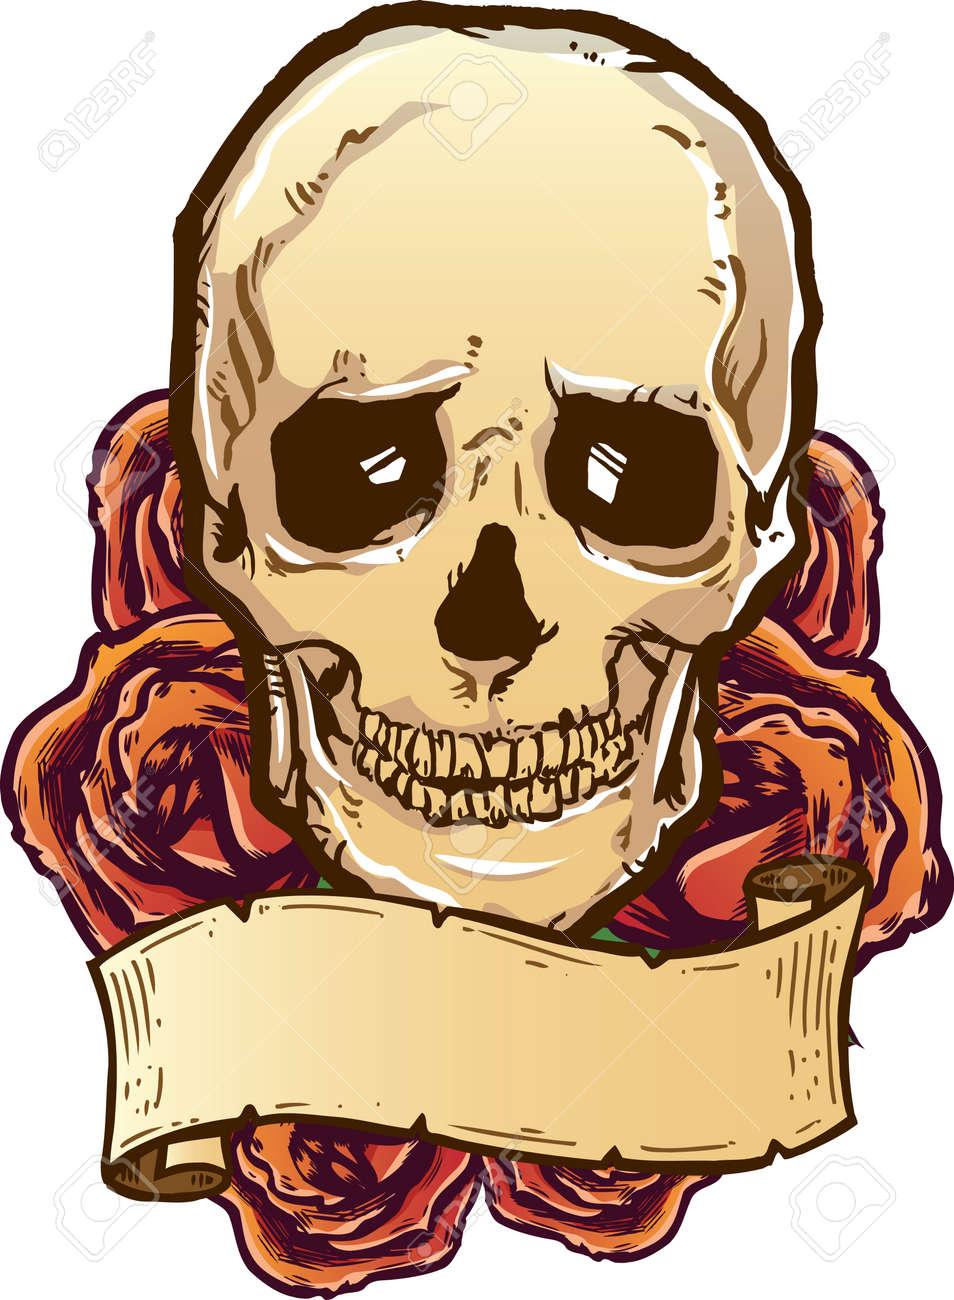 Skull roses and banner vector illustration. Fully editable Stock Vector - 4499910